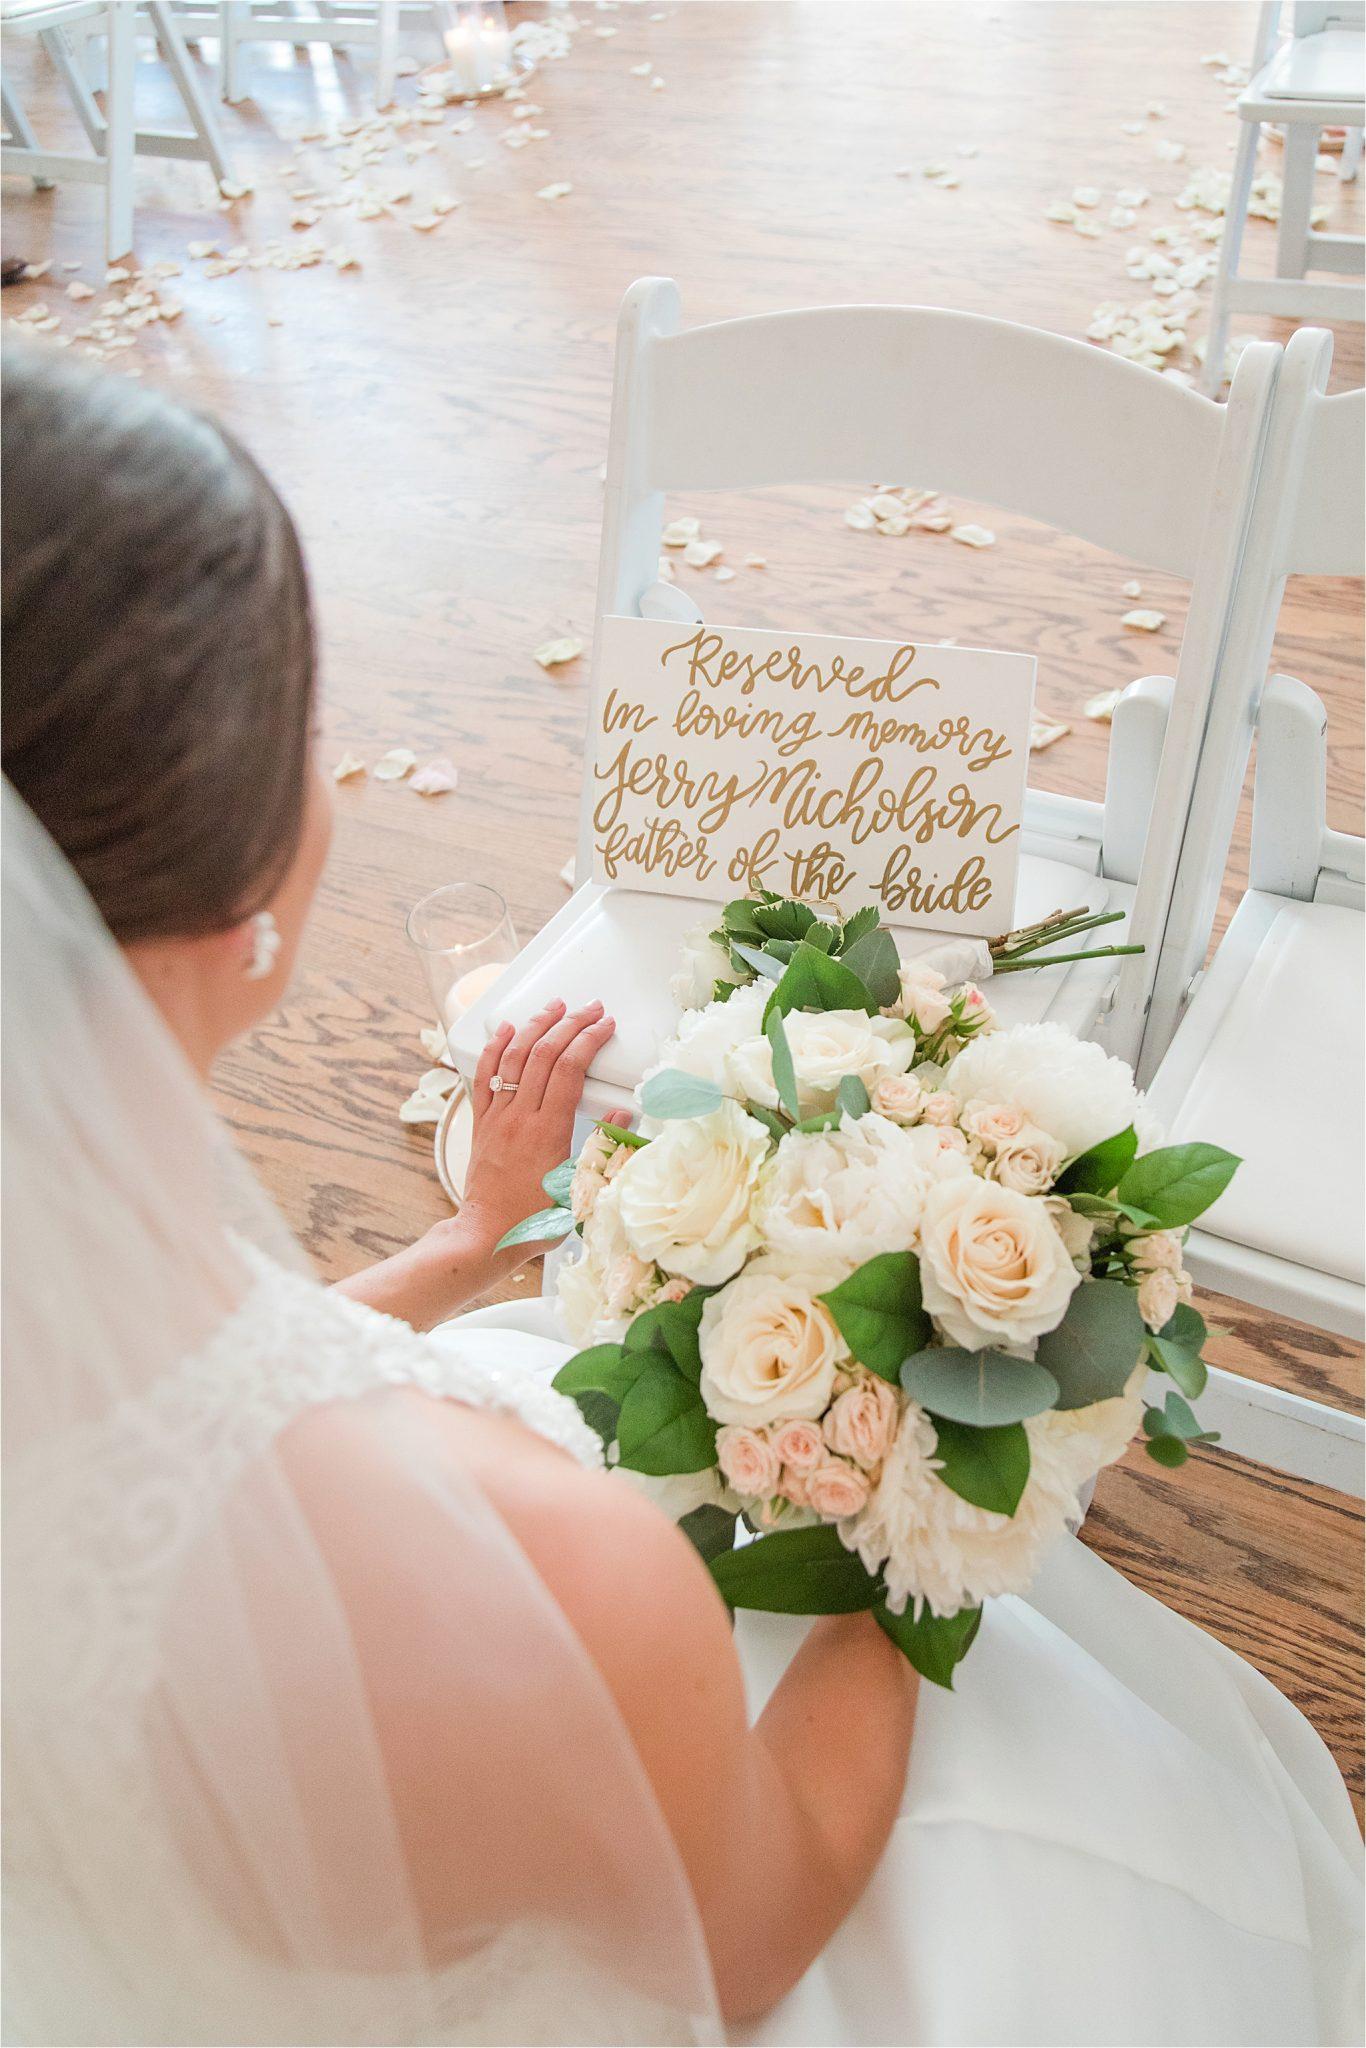 Birmingham Alabama Wedding Photographer, Deceased loved one, Mobile Alabama, Wedding florals